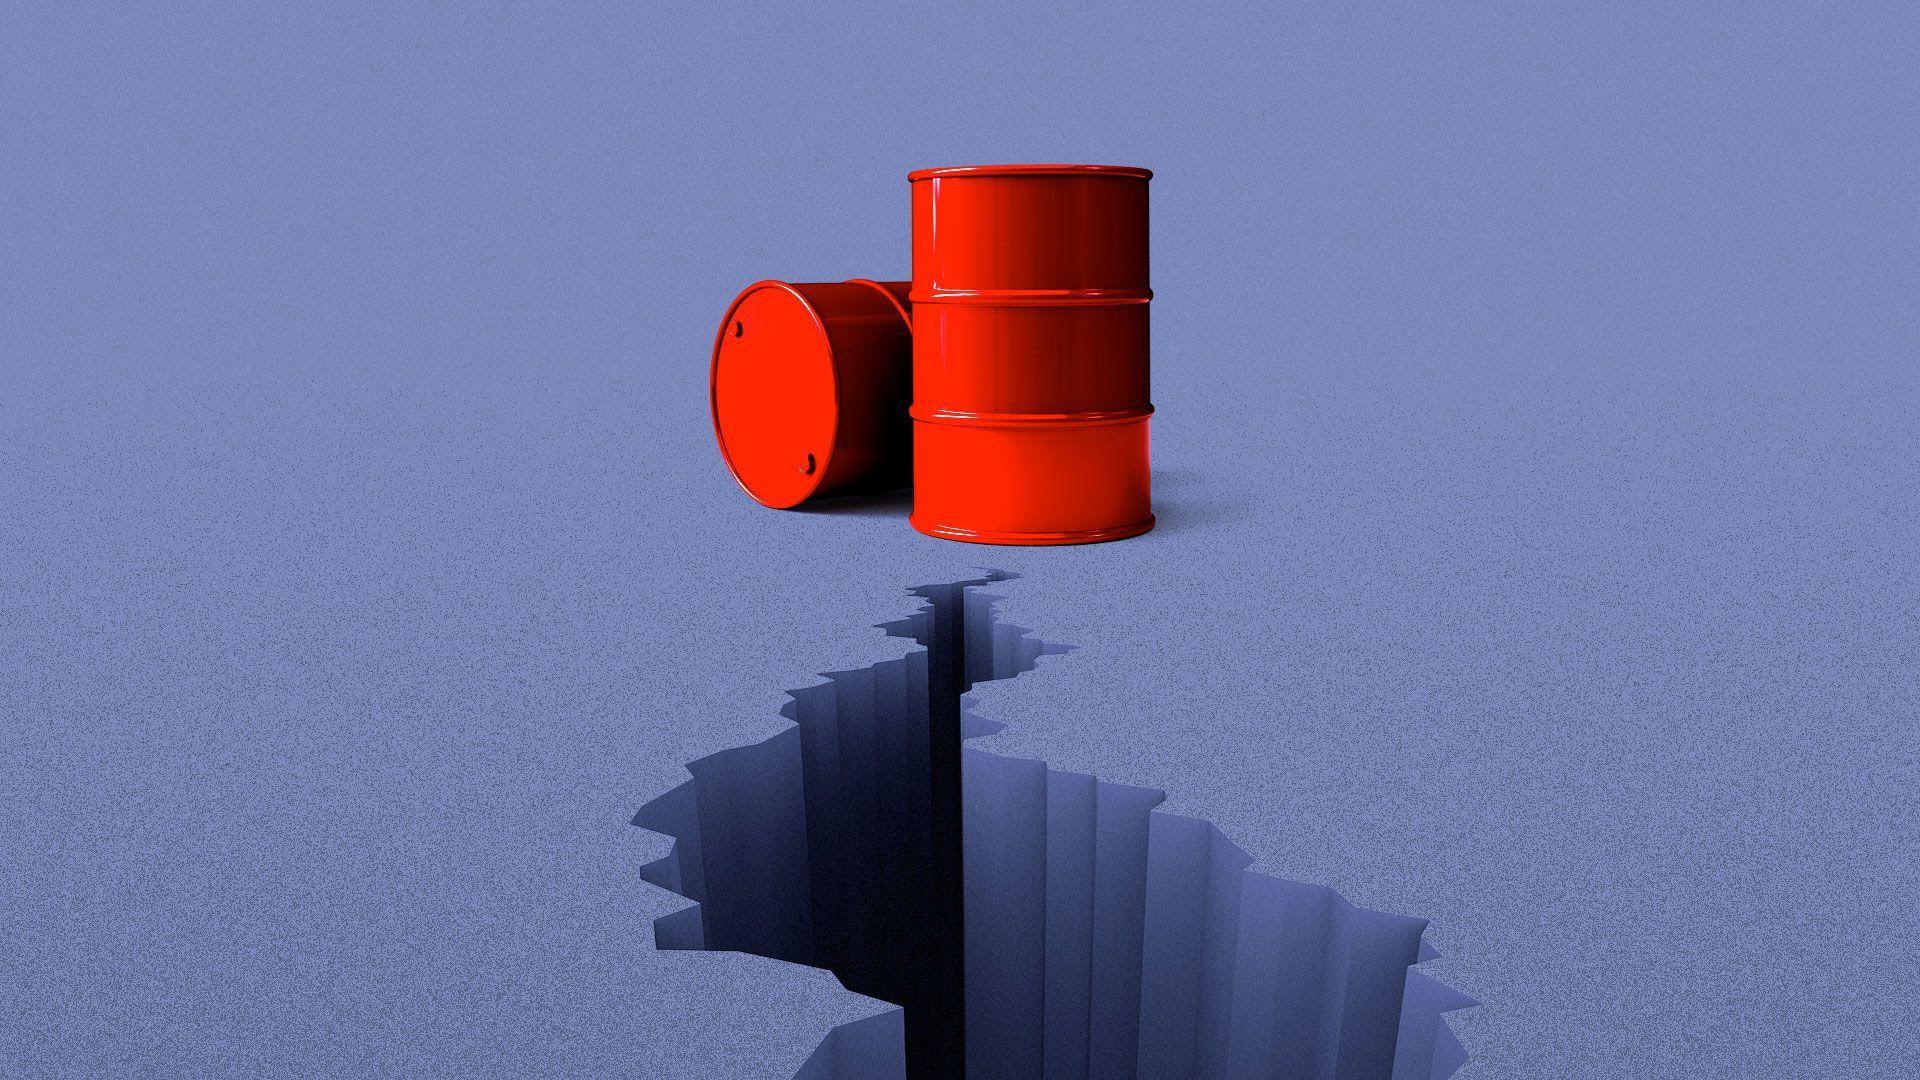 Illustration of a growing crack heading towards oil barrels